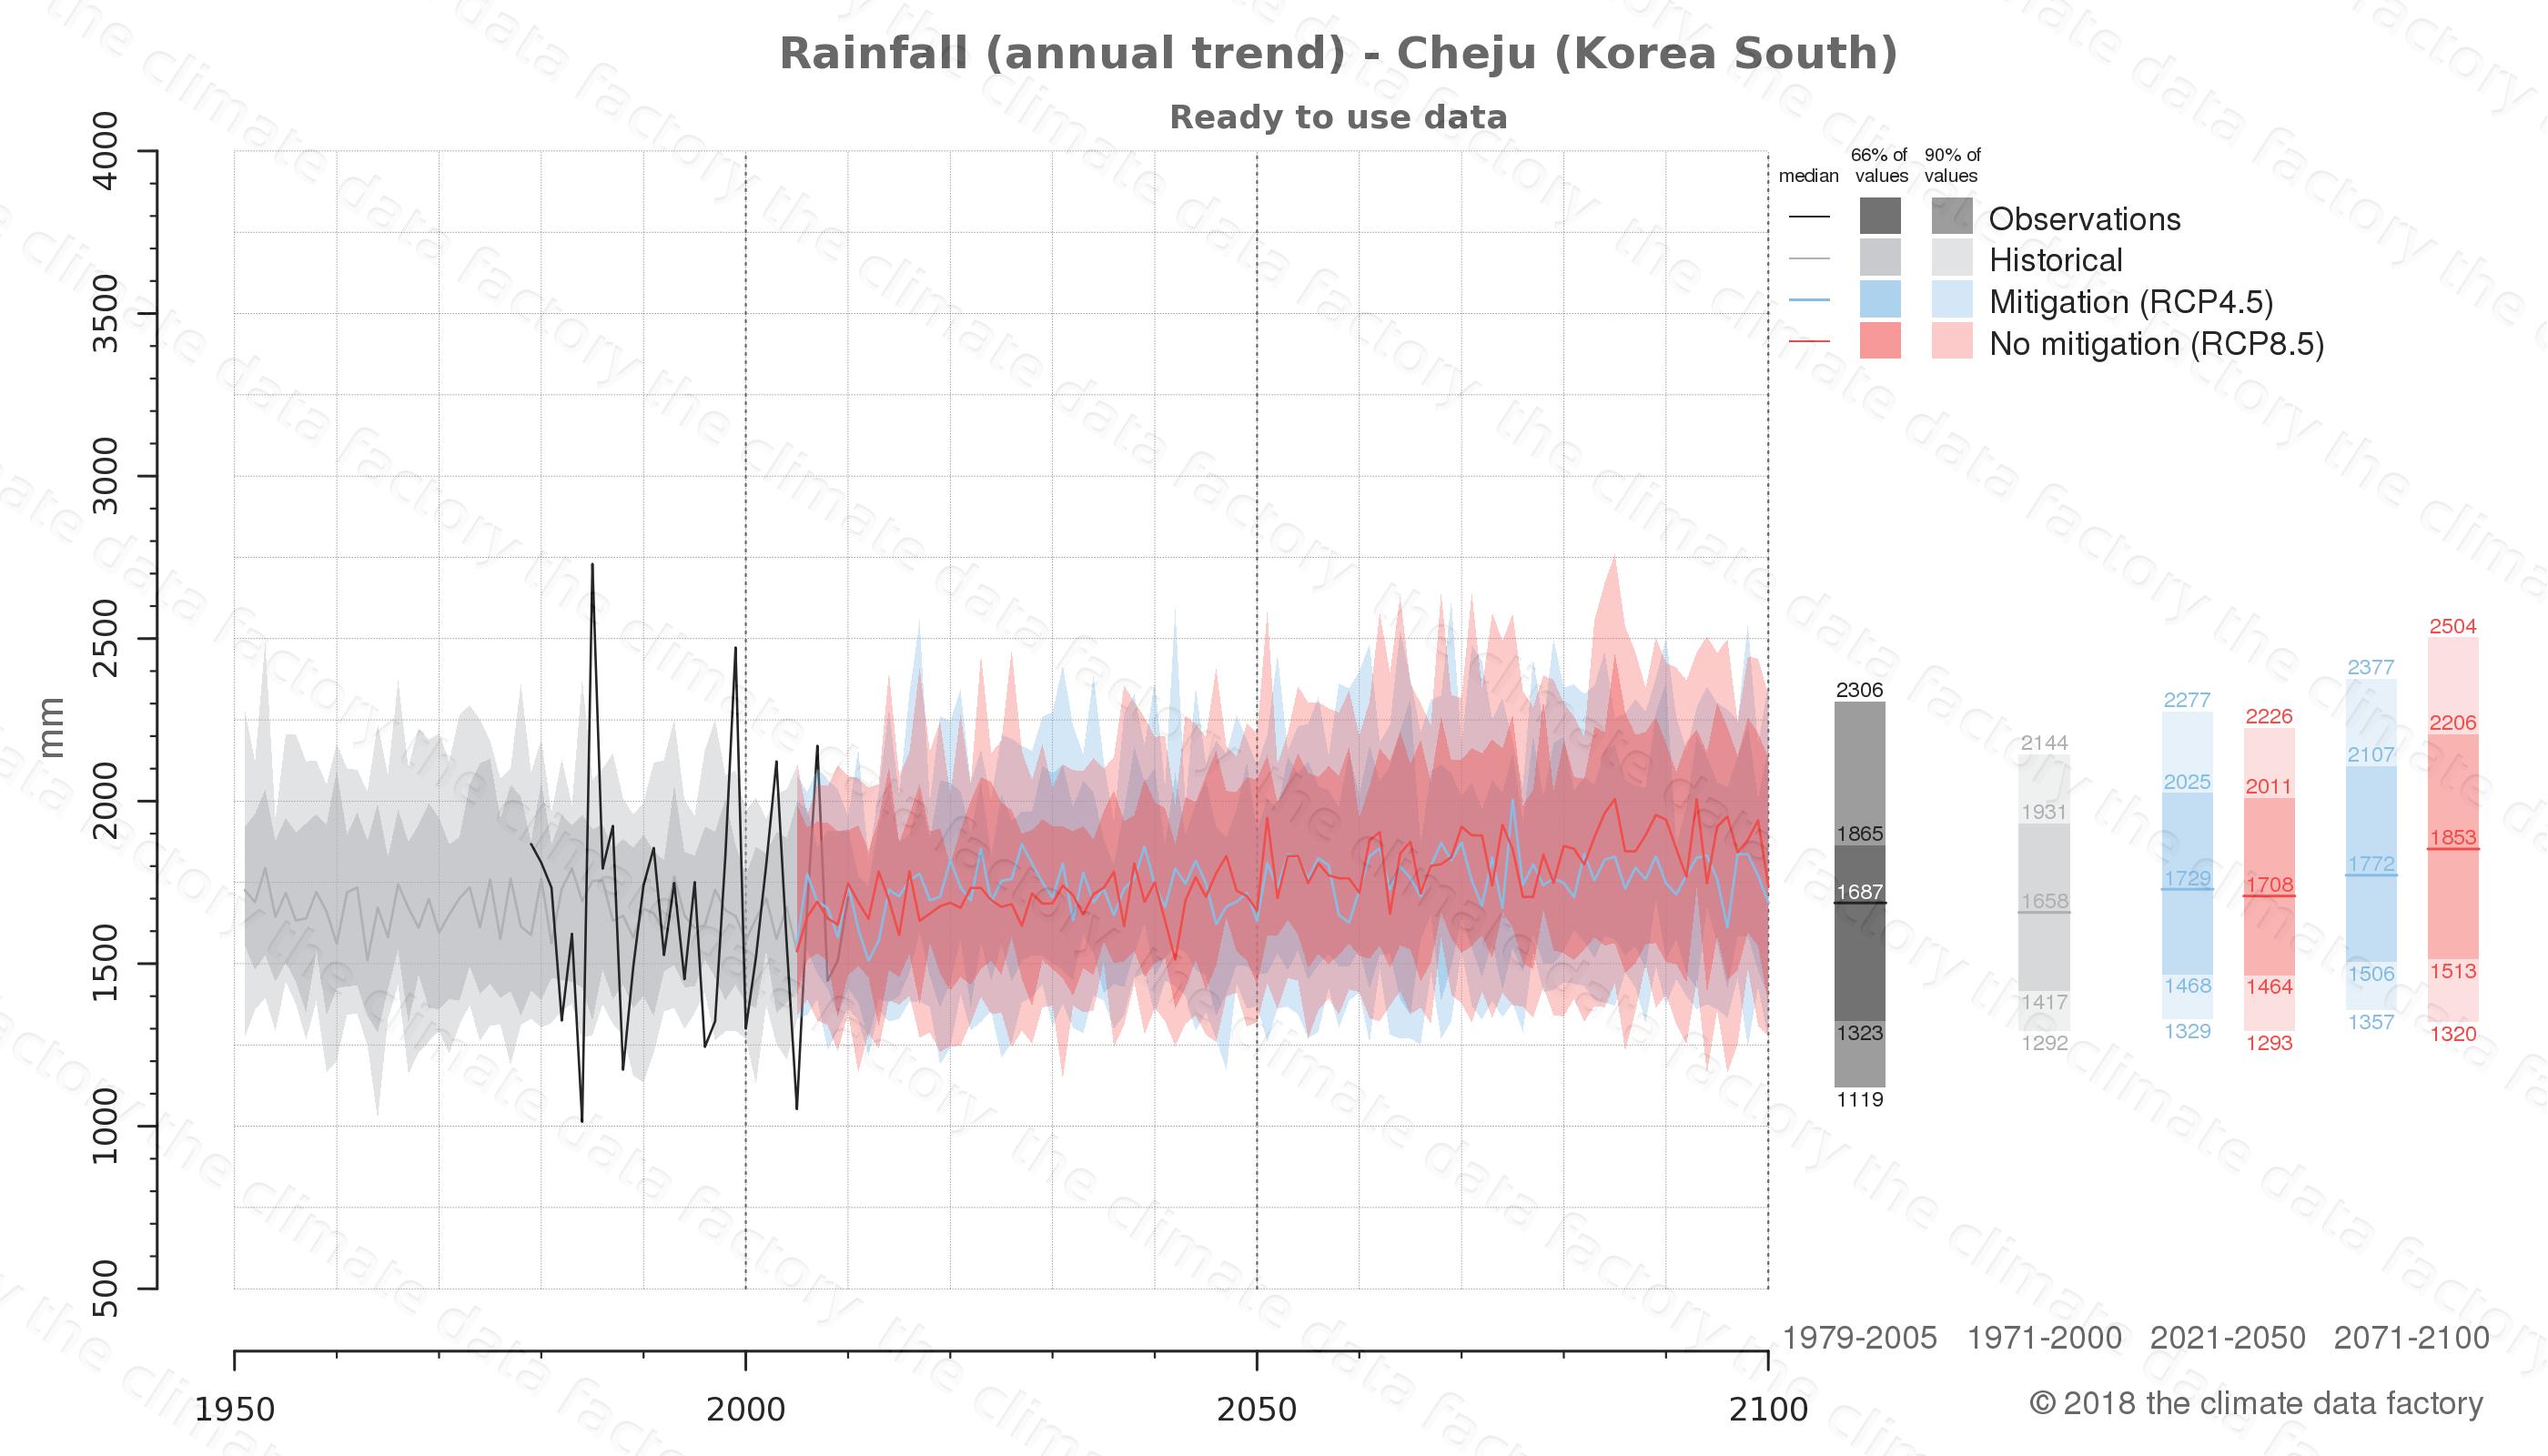 climate change data policy adaptation climate graph city data rainfall cheju south korea